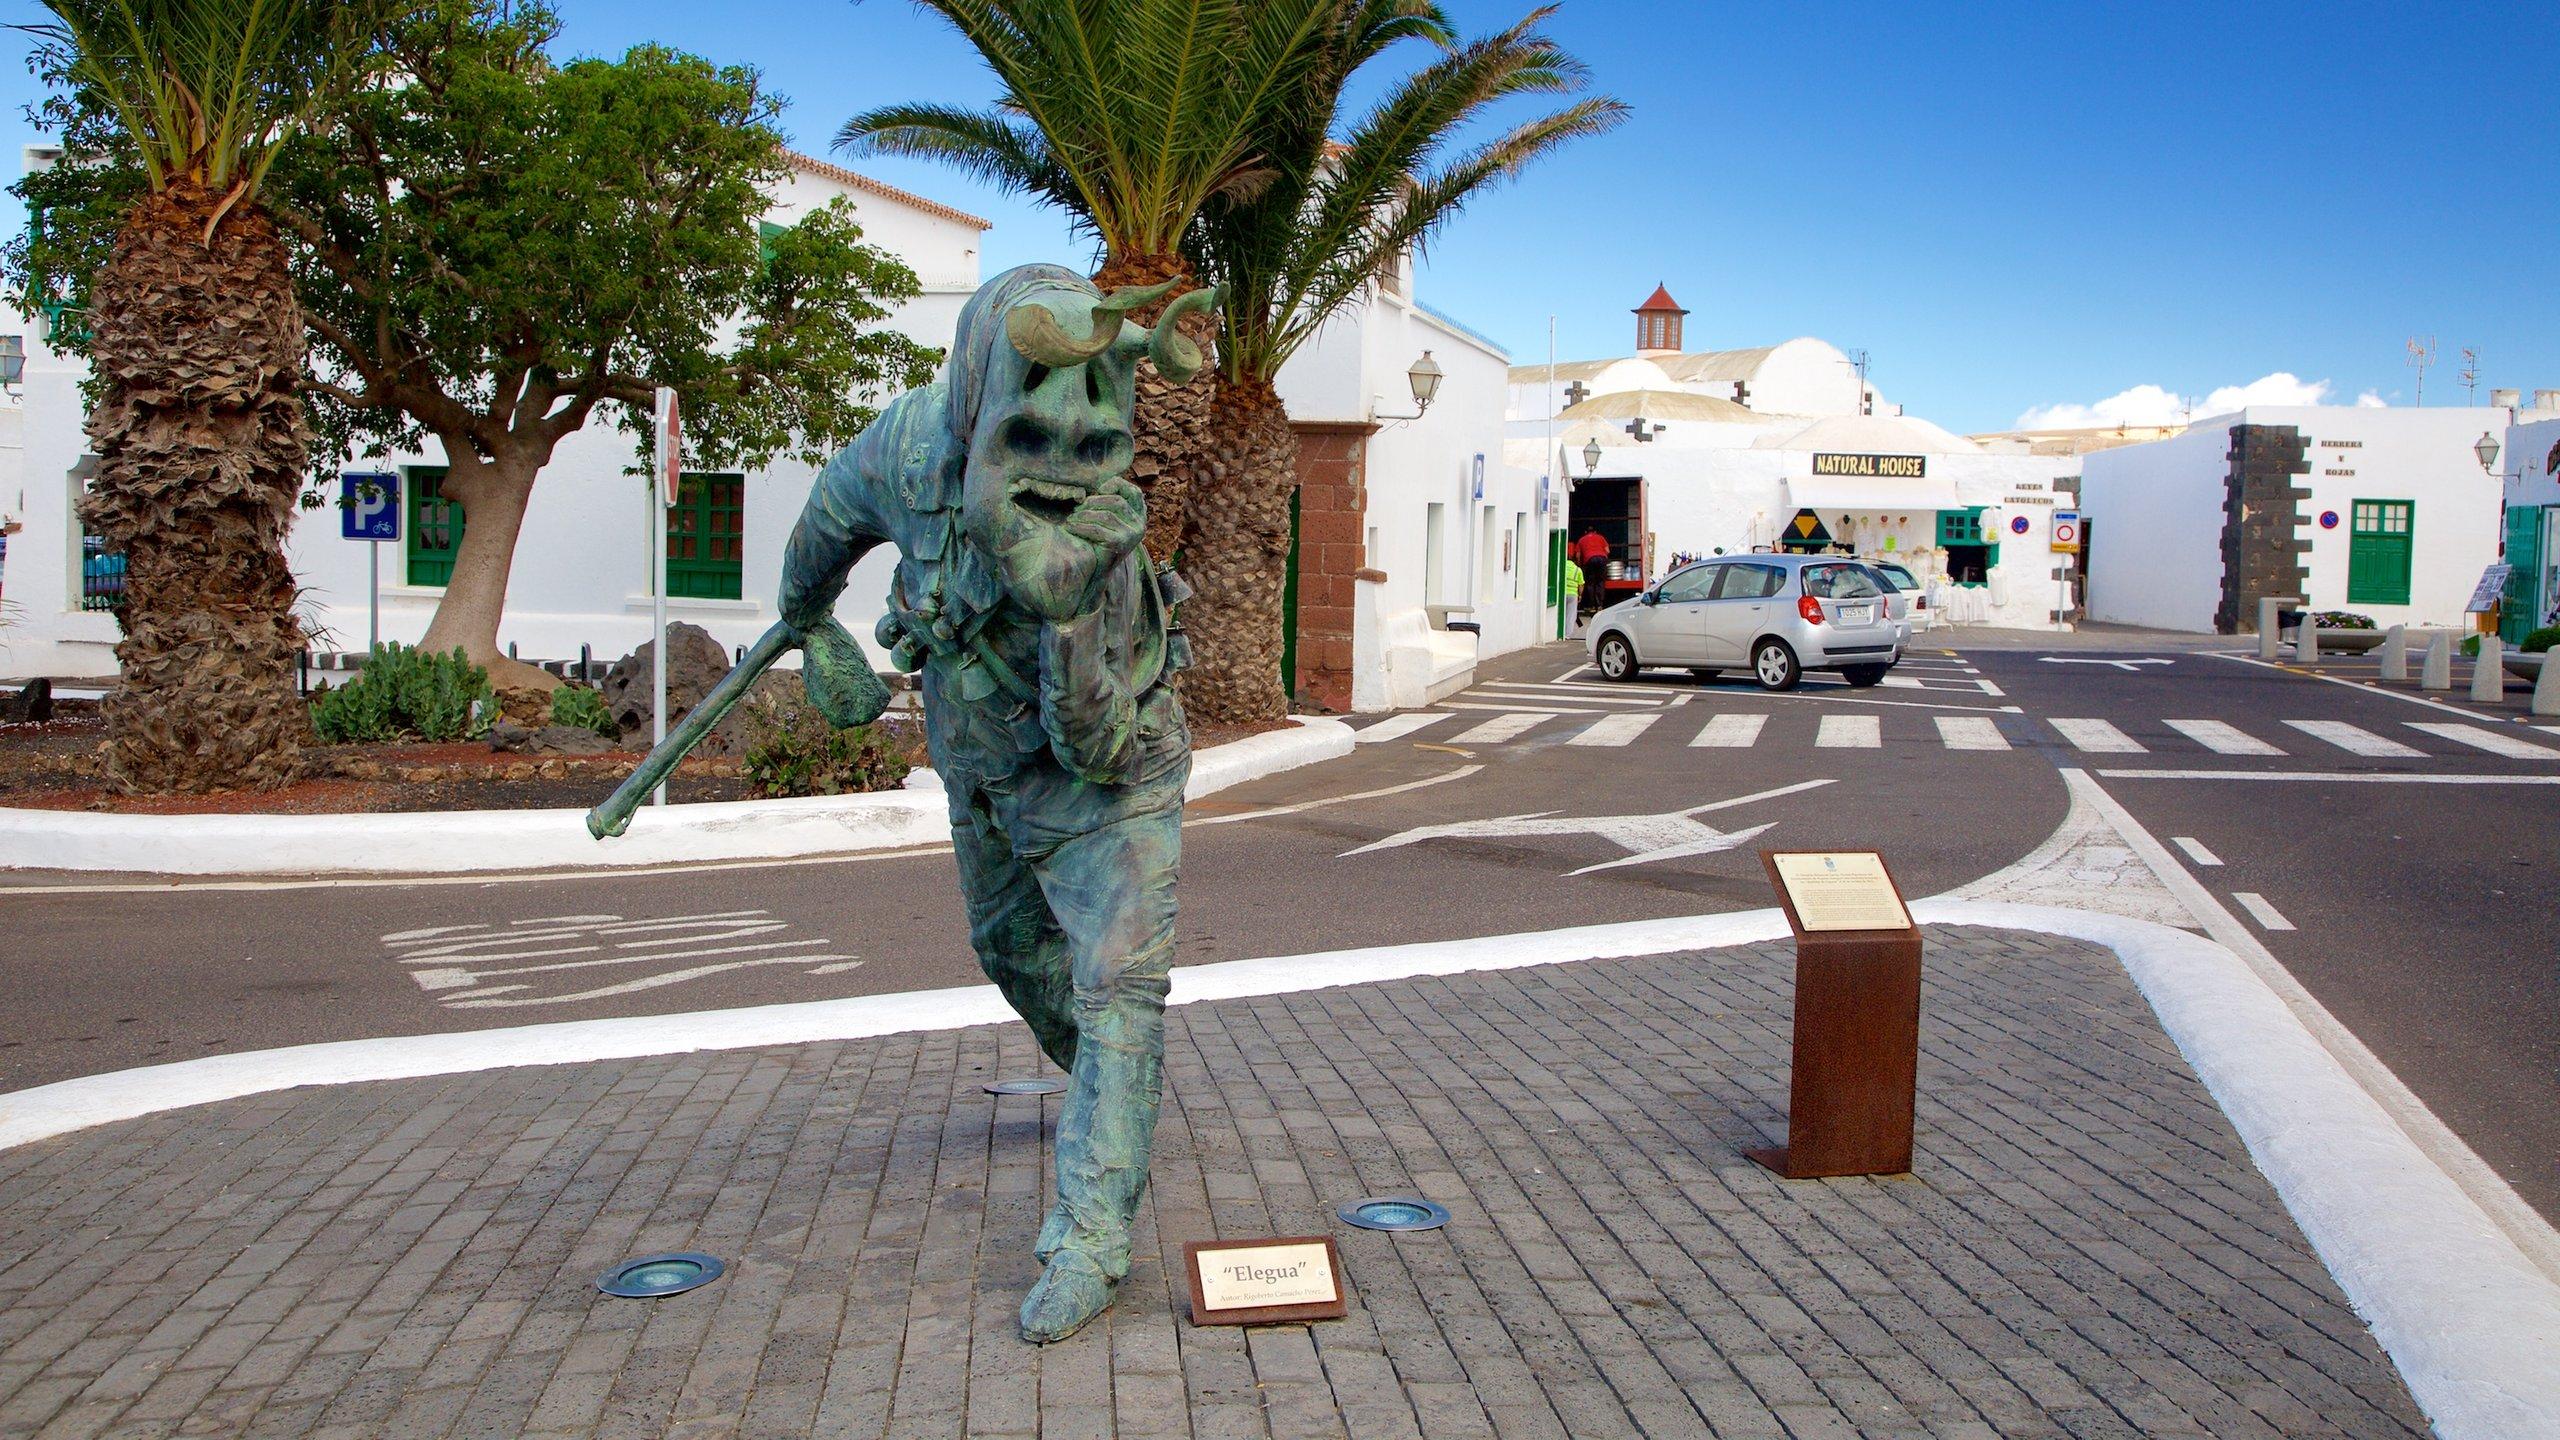 Teguise, Canary Islands, Spain